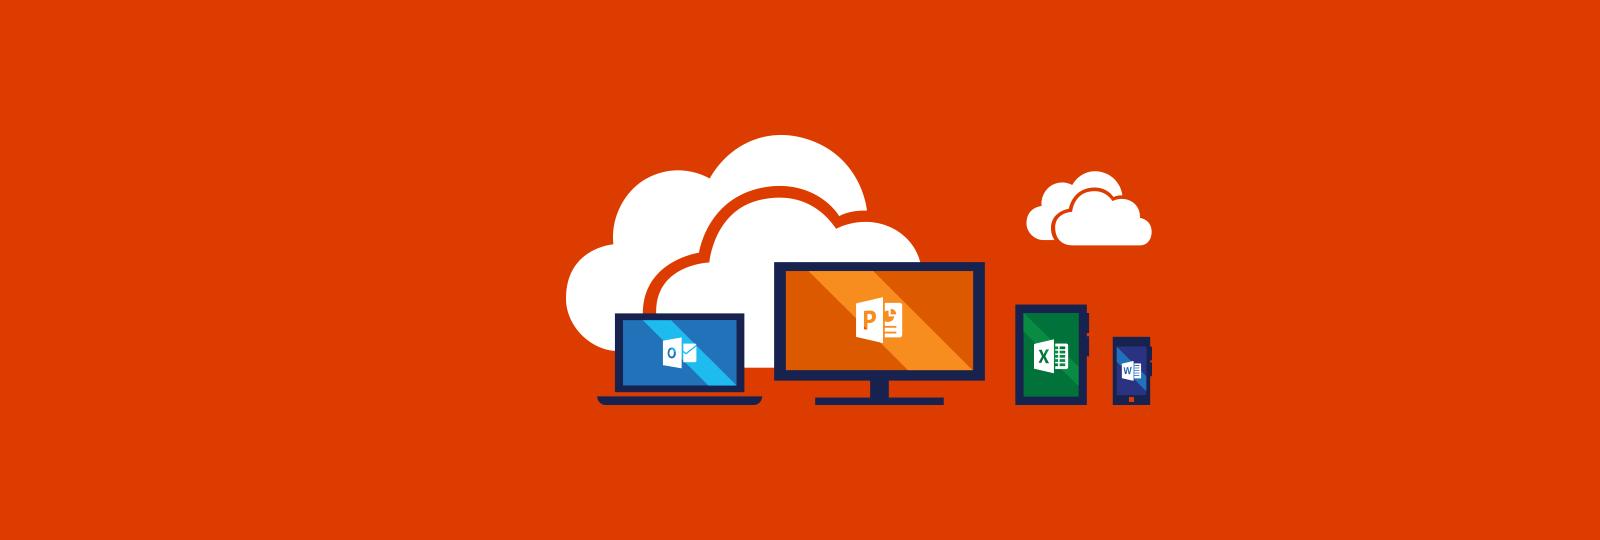 Office 365: Tips & Tricks